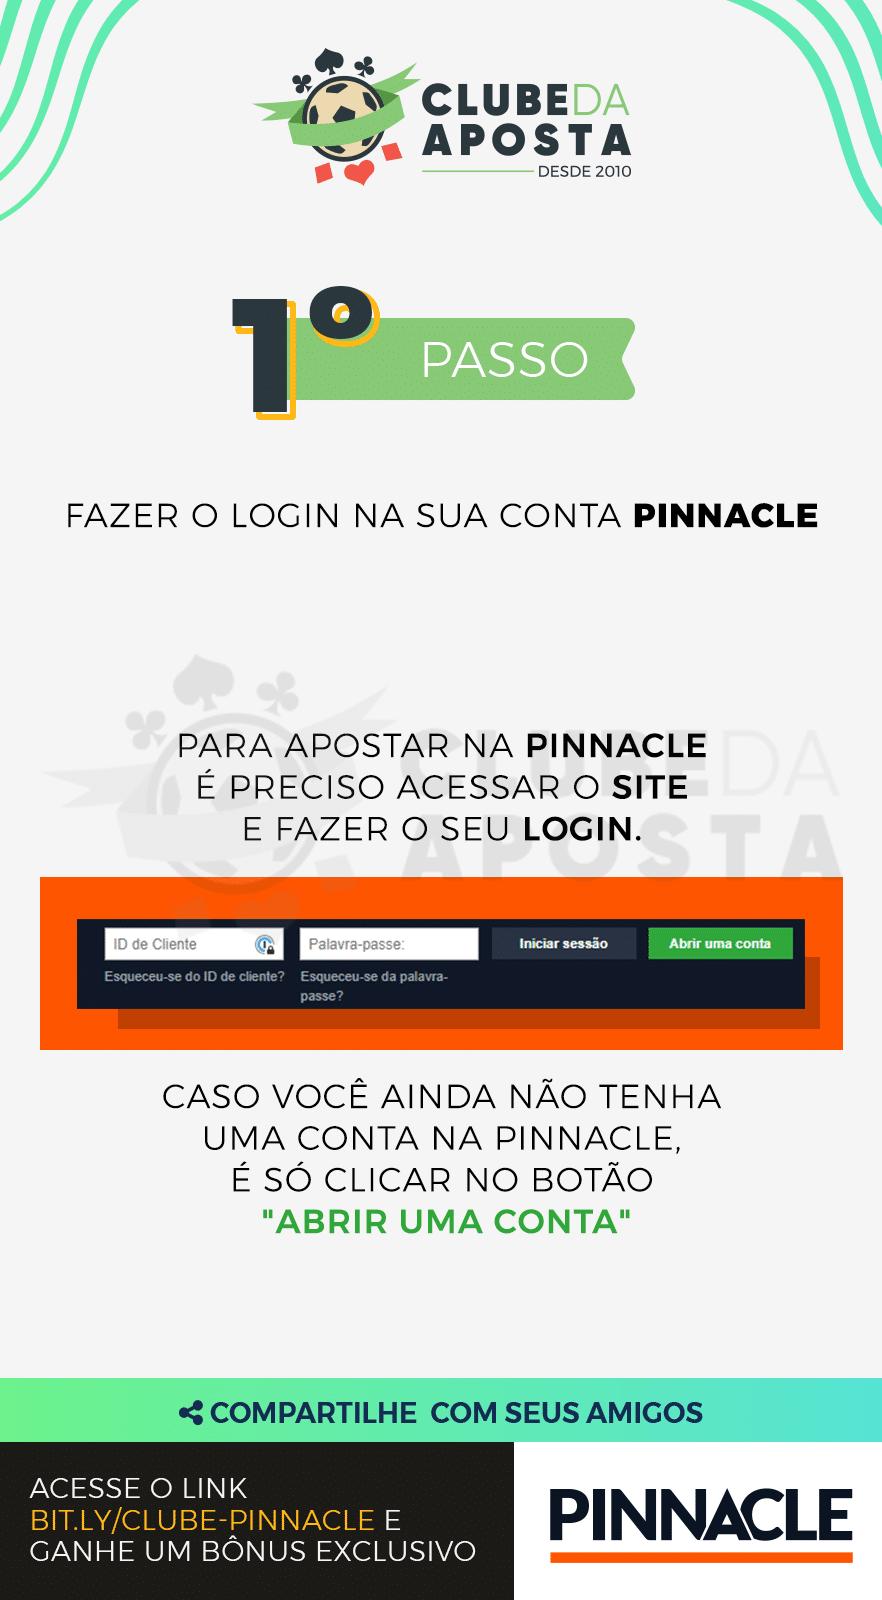 como-apostar-na-pinnacle_passo1